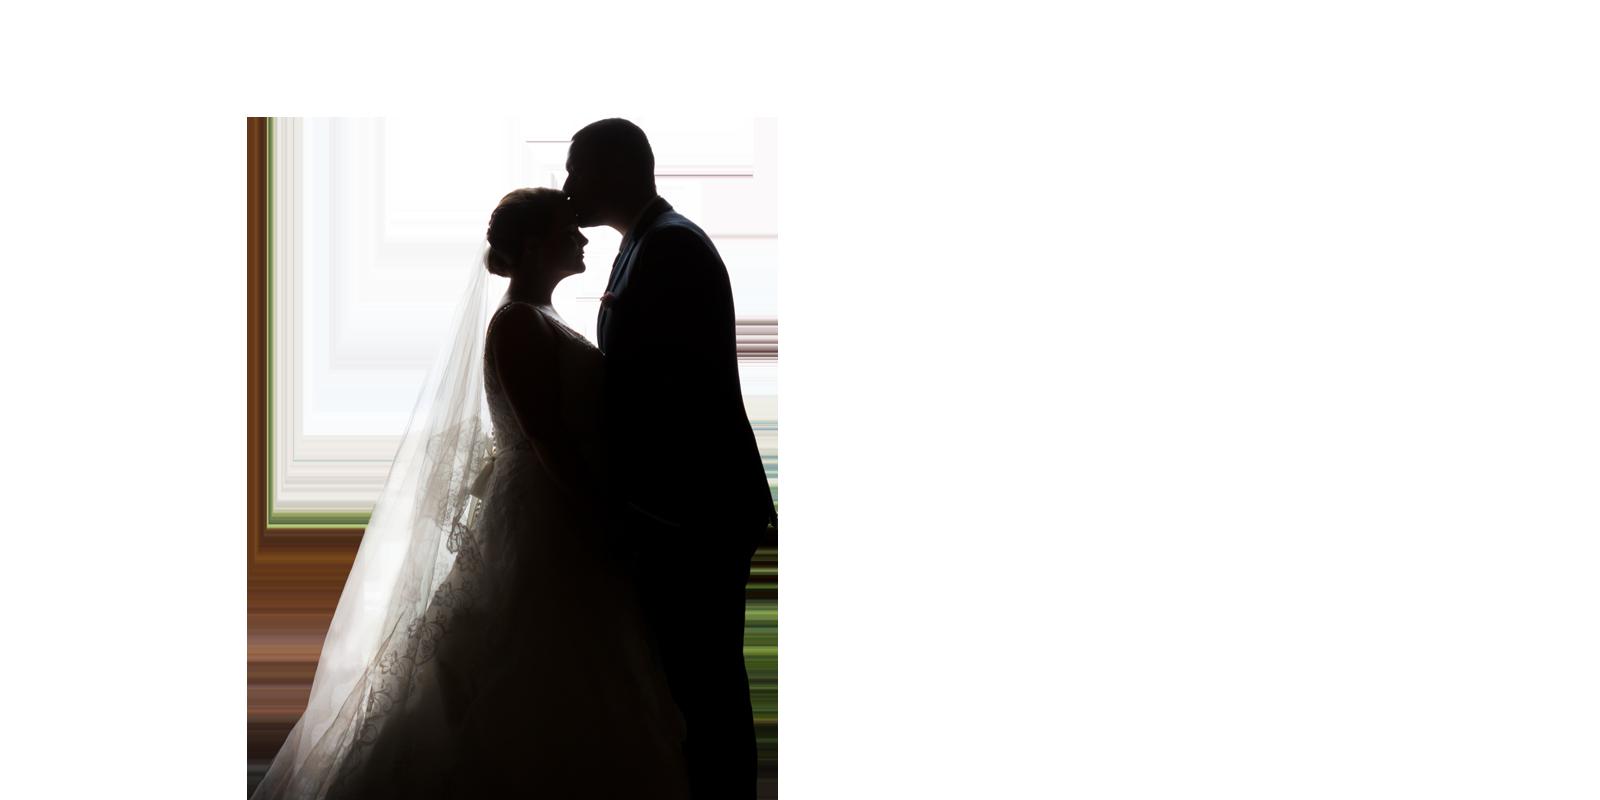 Clipart wedding transparent background. Couple calendario and